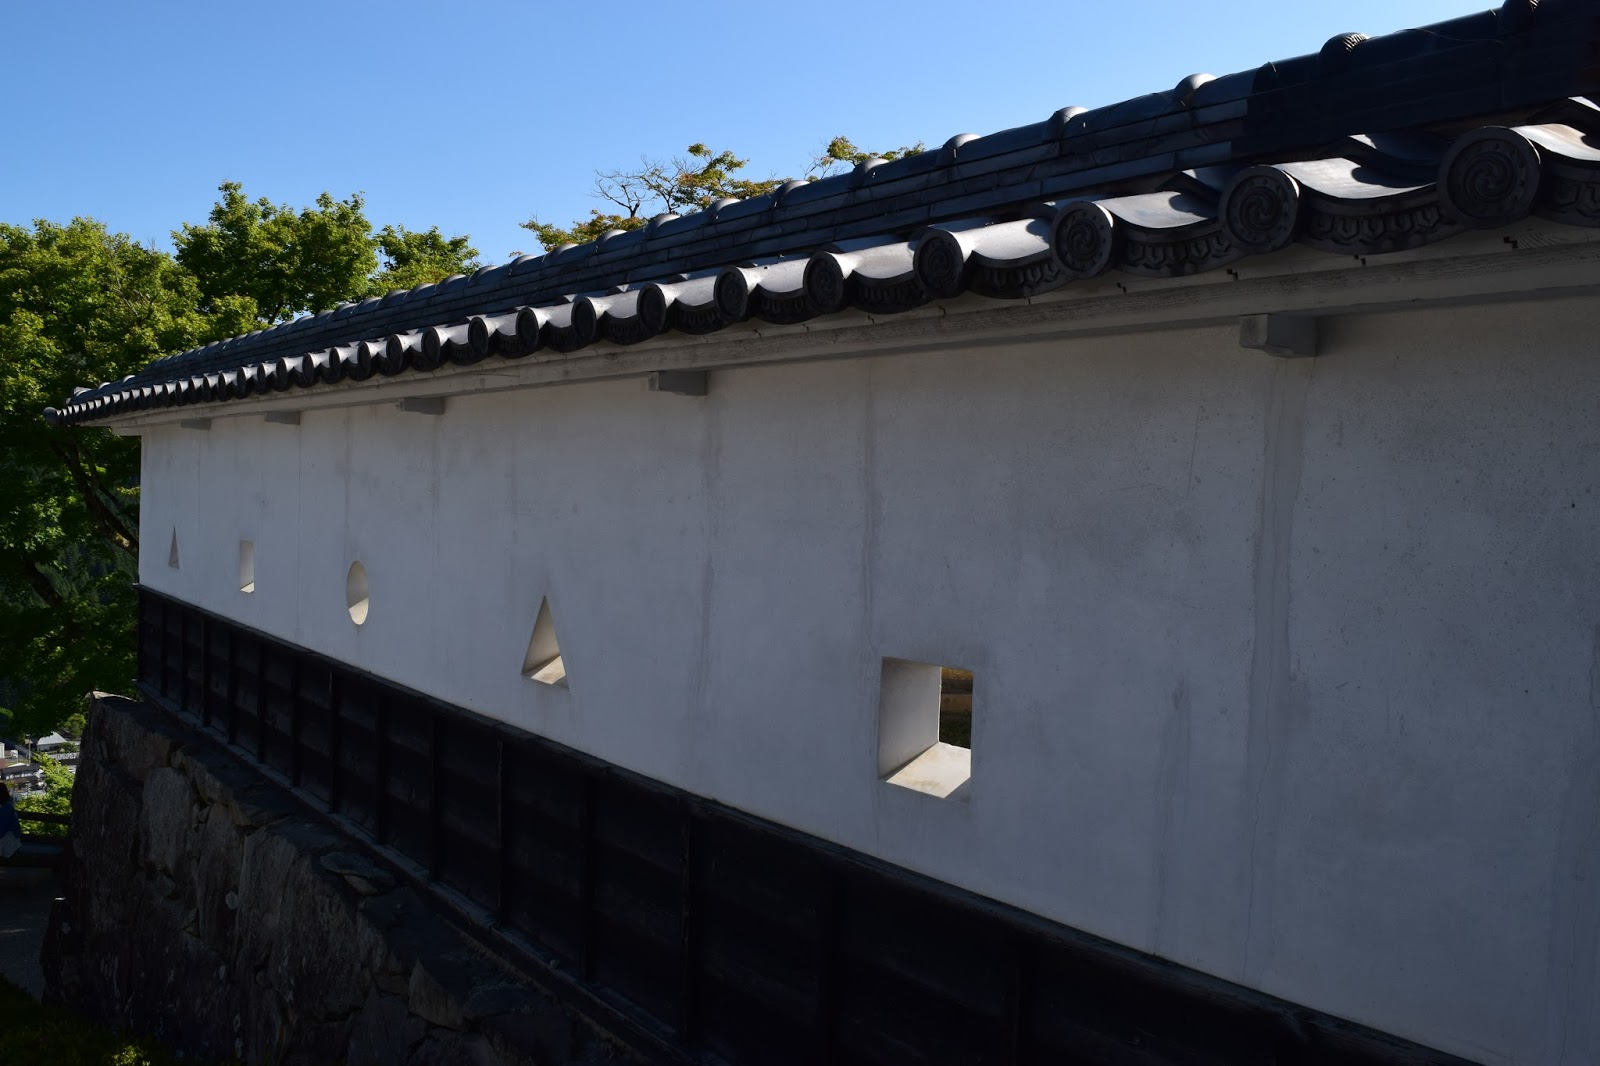 Gujou Hachiman Castle